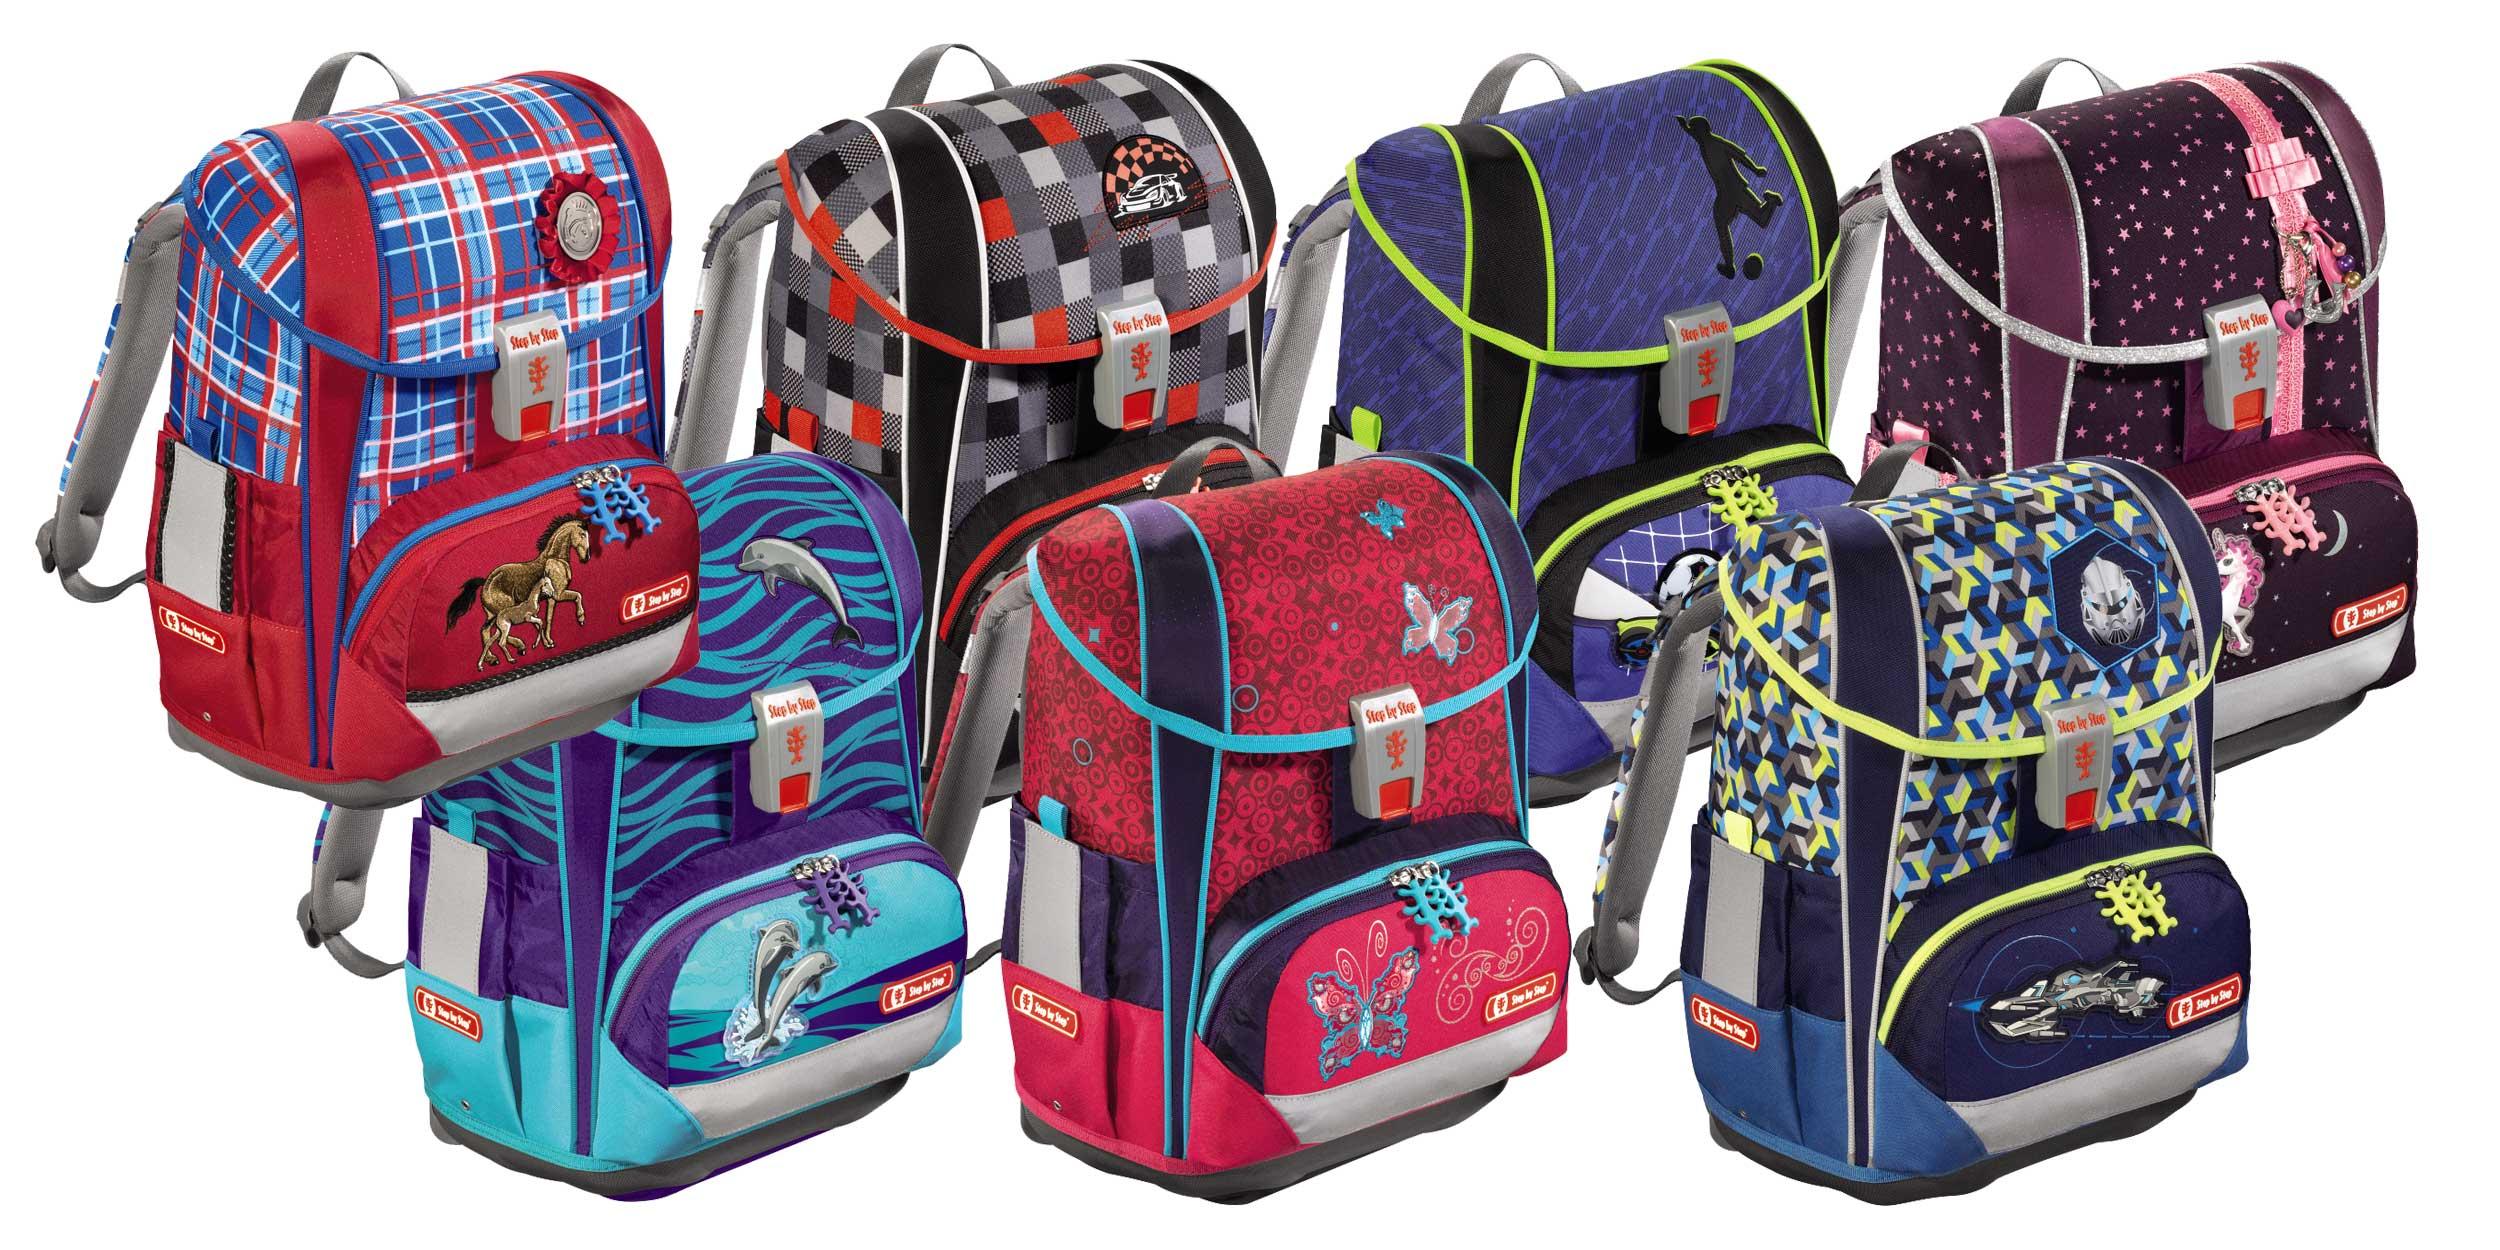 24d0a8a26d Školské tašky Target online predaj e-shop